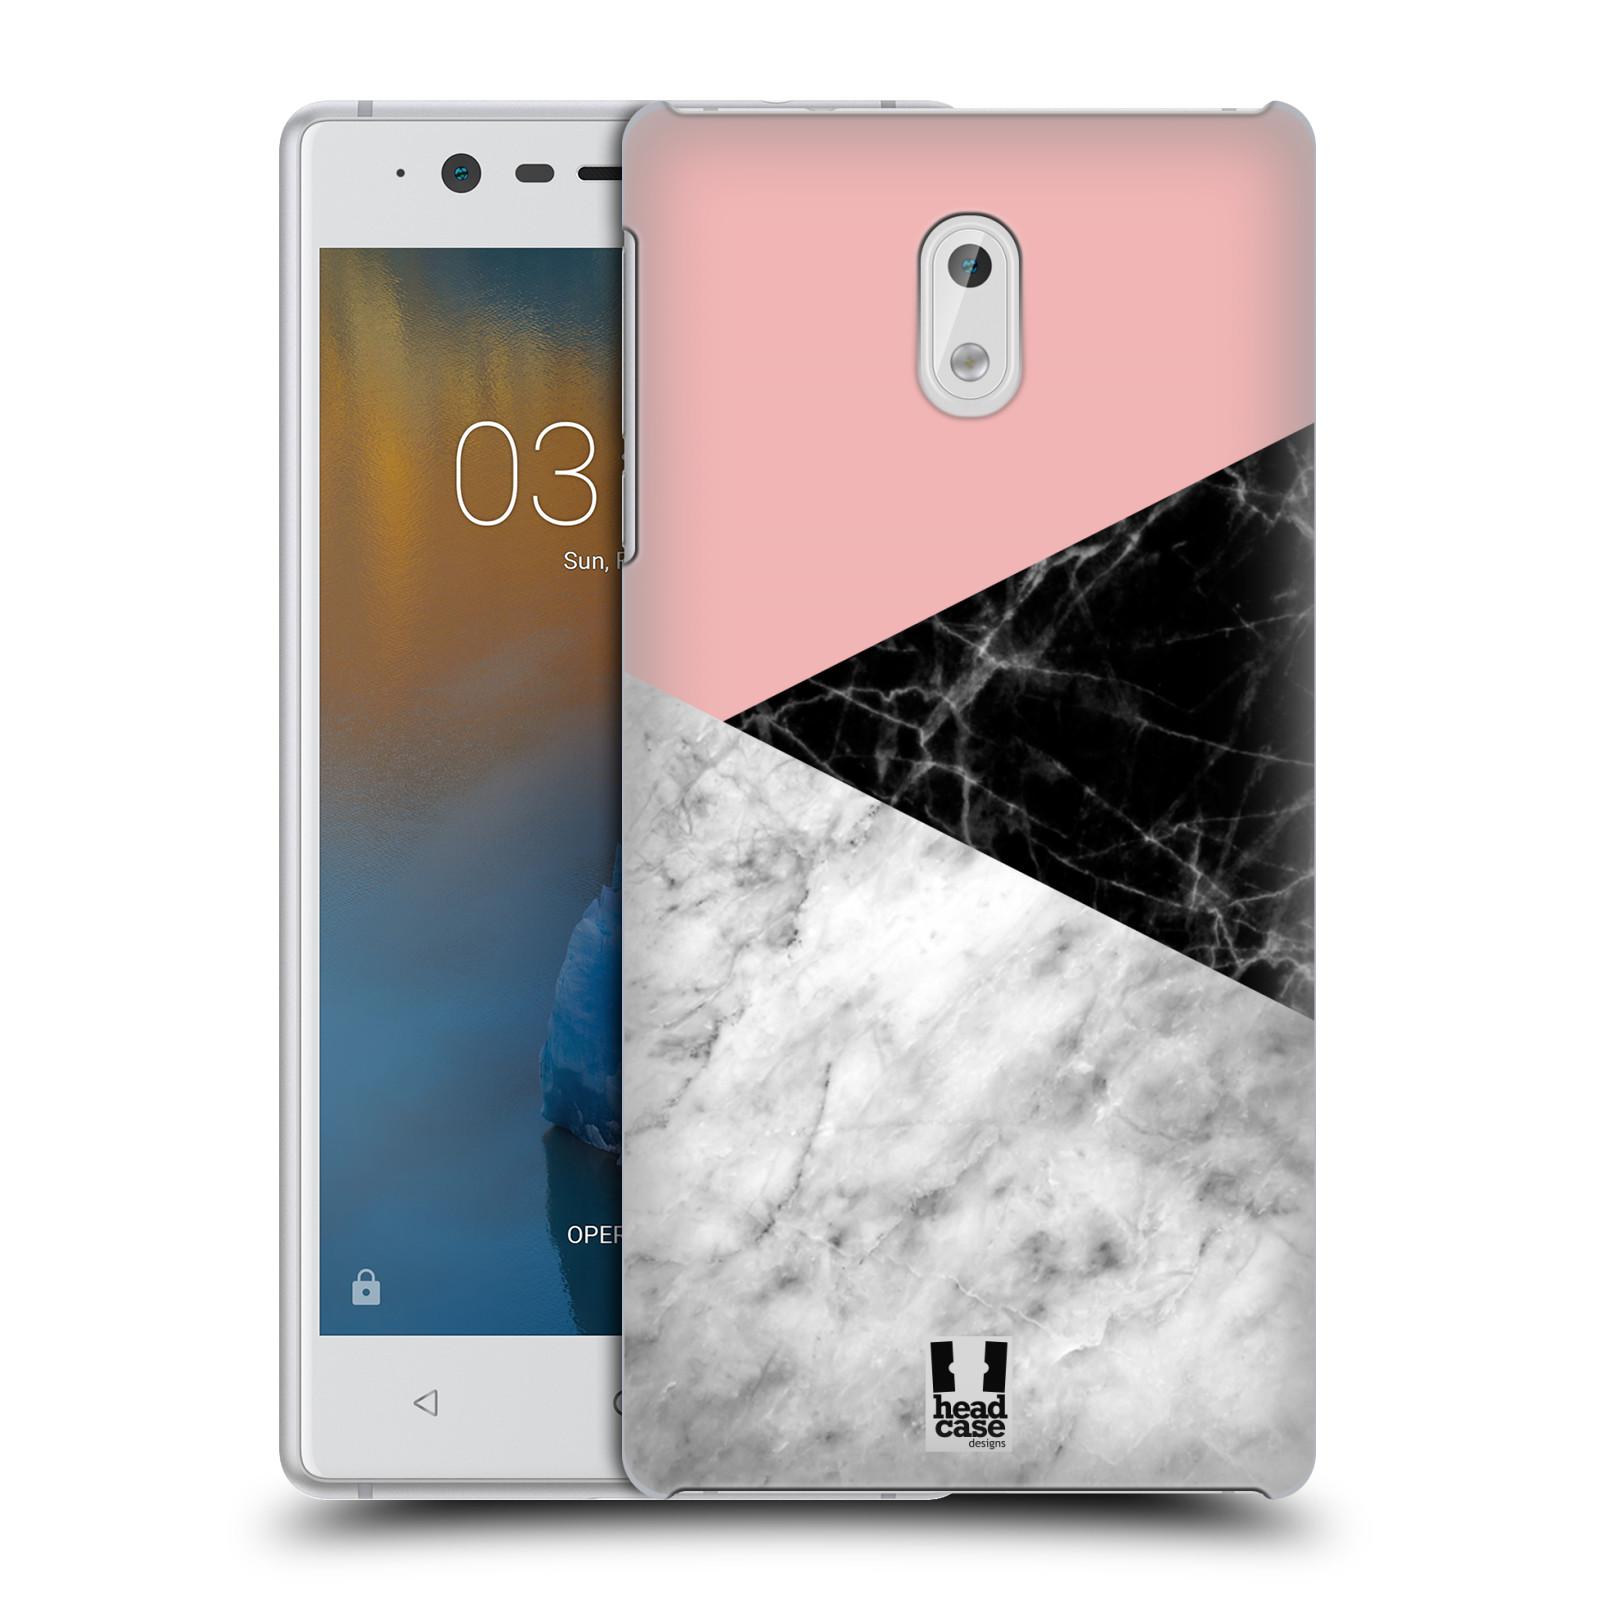 Plastové pouzdro na mobil Nokia 3 Head Case - Mramor mix